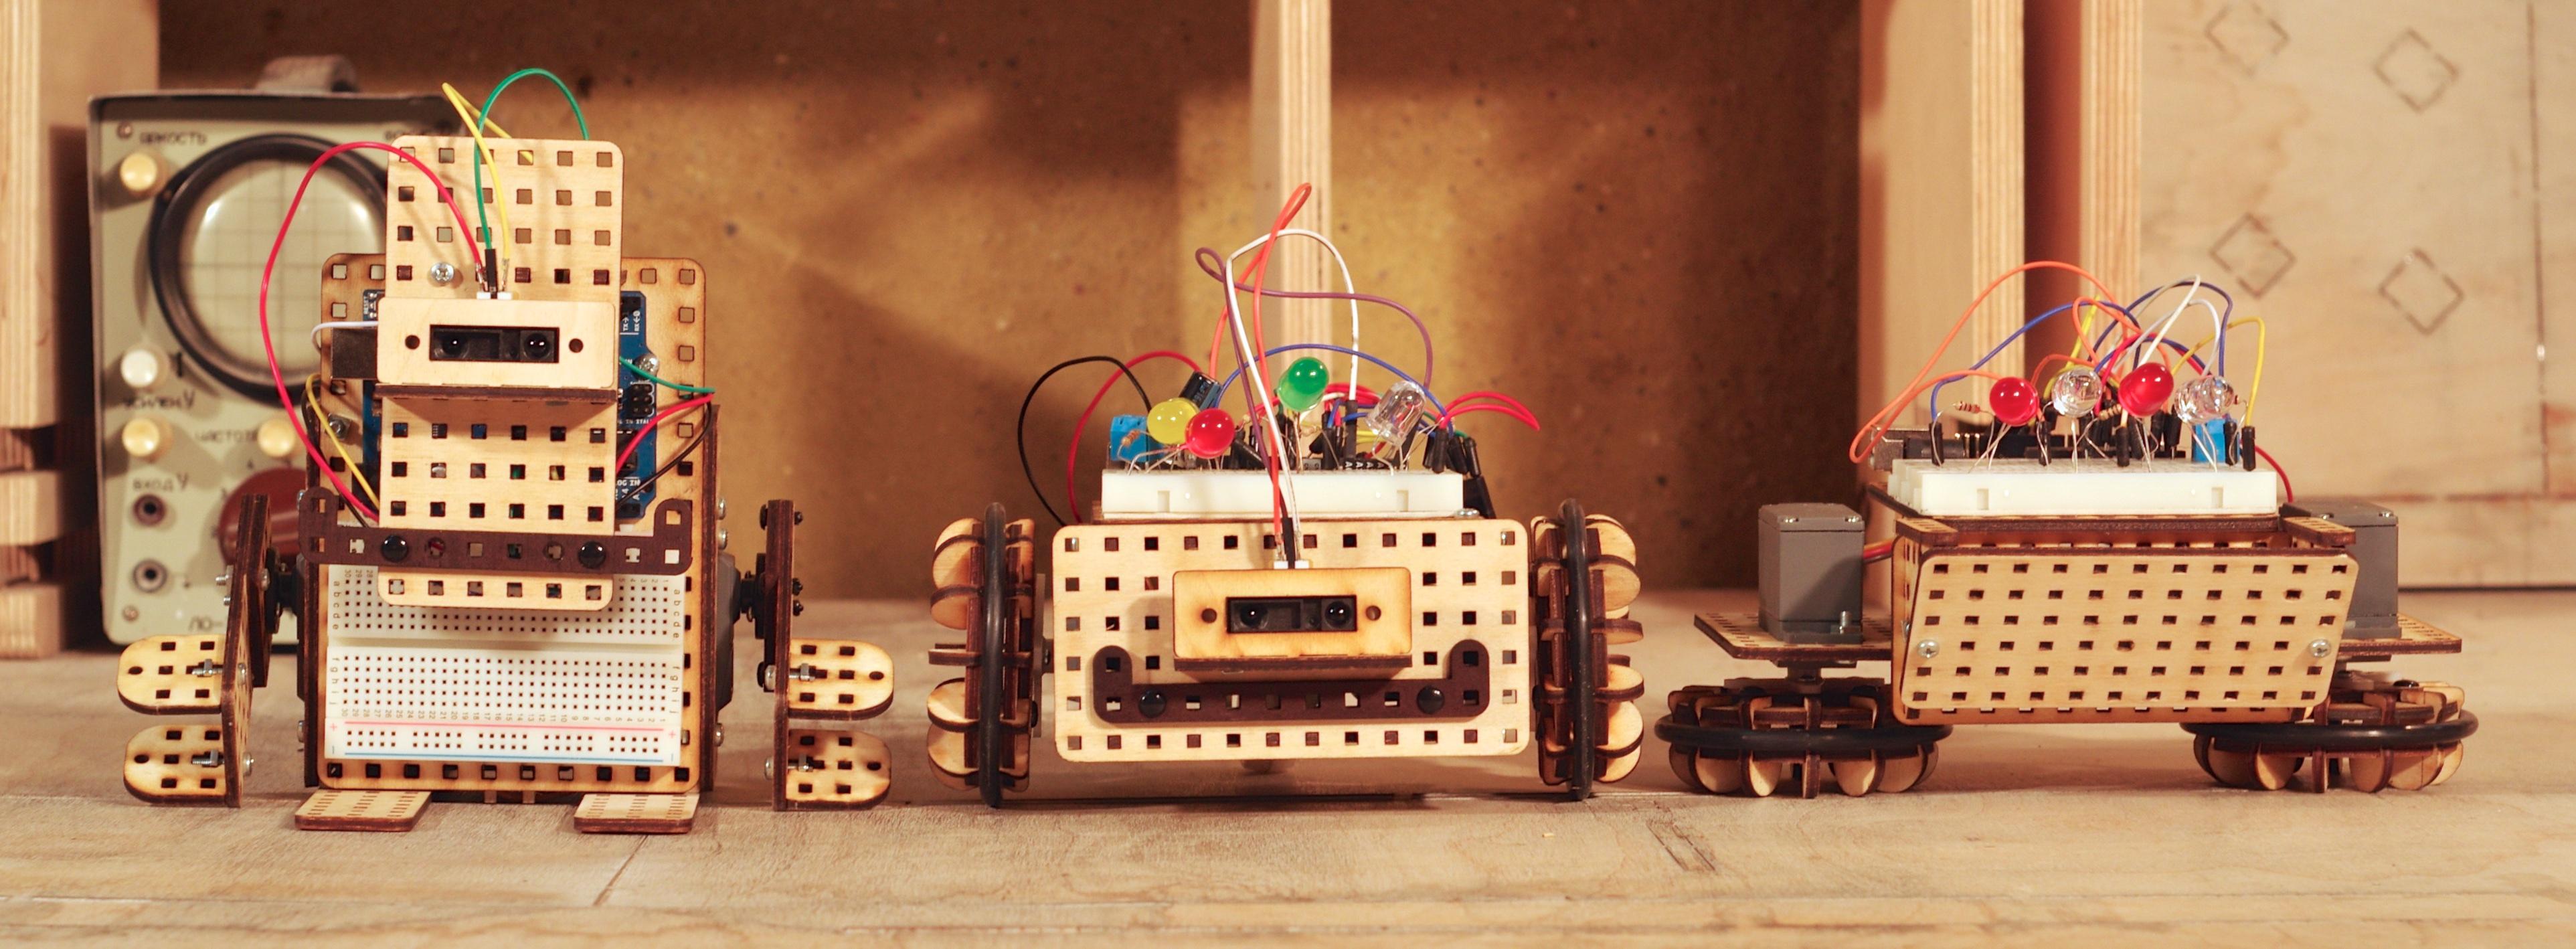 LO FI Robot (2)